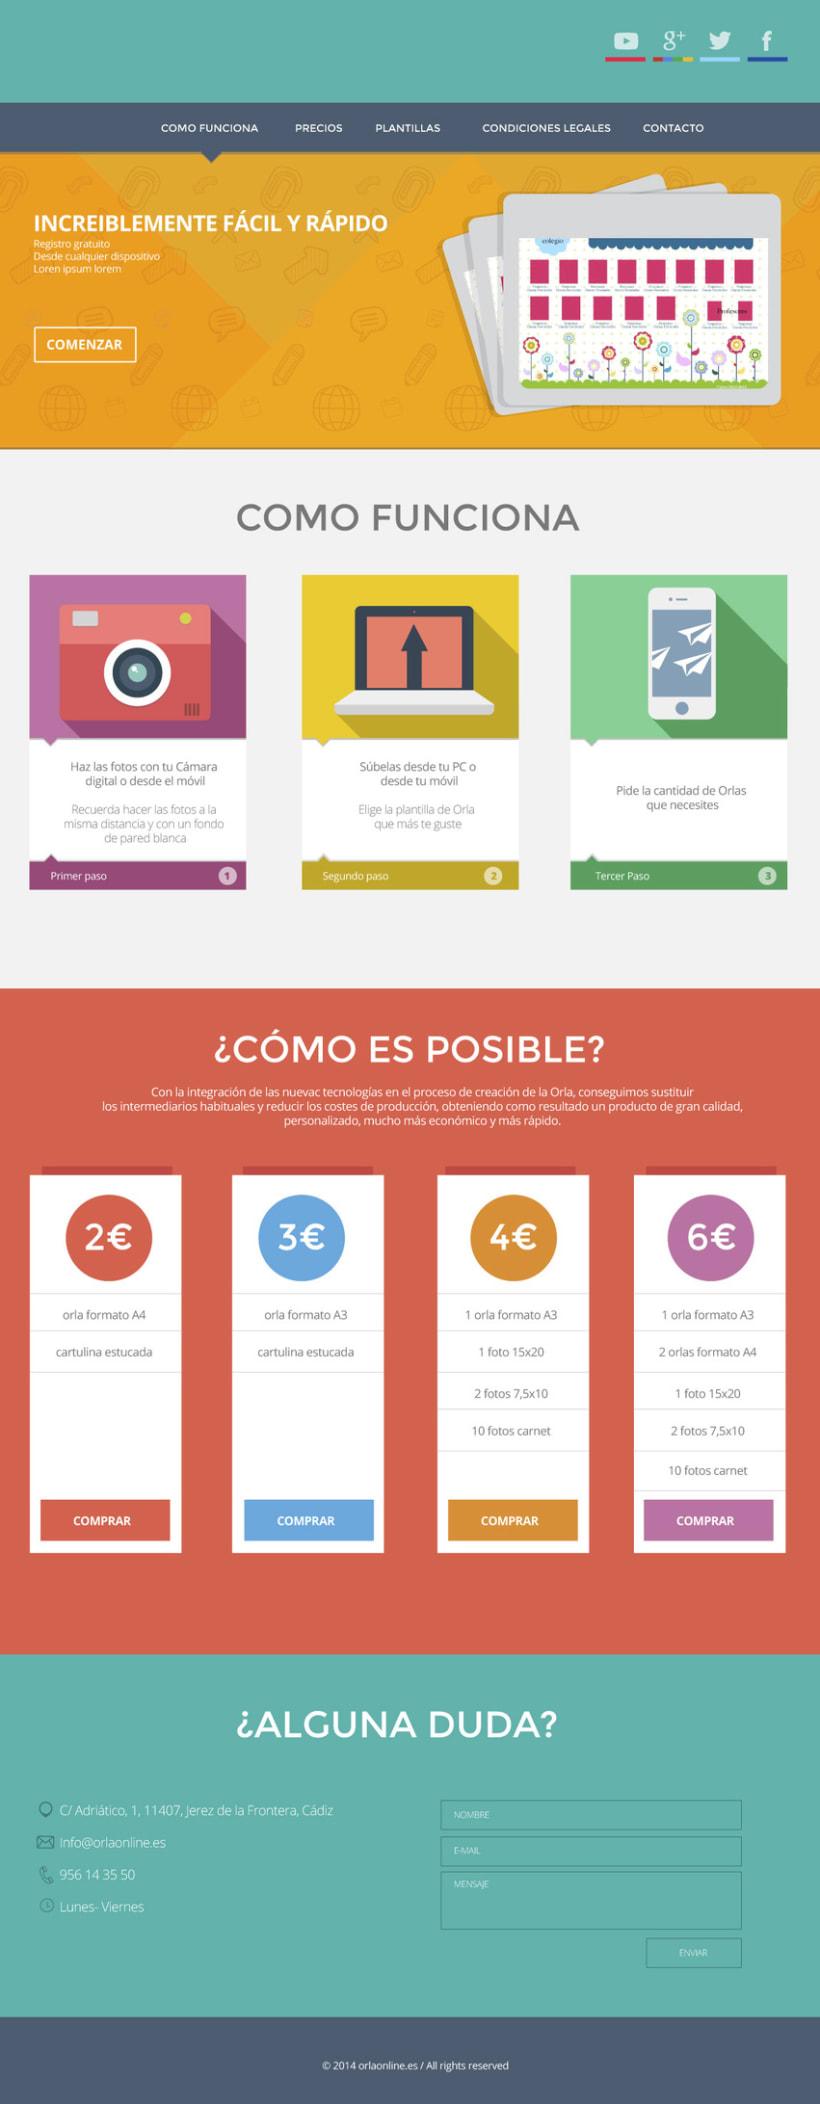 Orlaonline / Nuevo diseño web 2014 -1